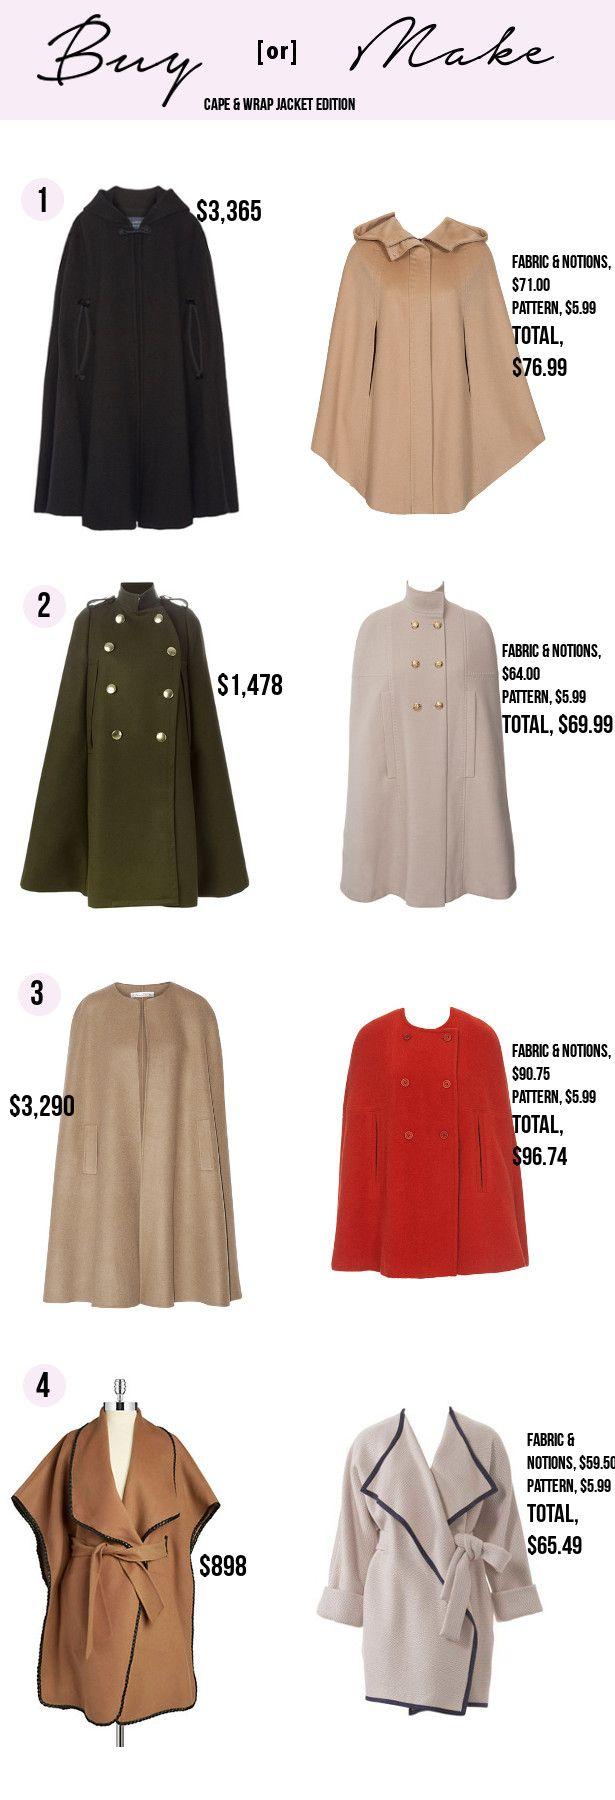 Buy or Make: Cape & Wrap Jacket Edition – Sewing Blog | BurdaStyle.com